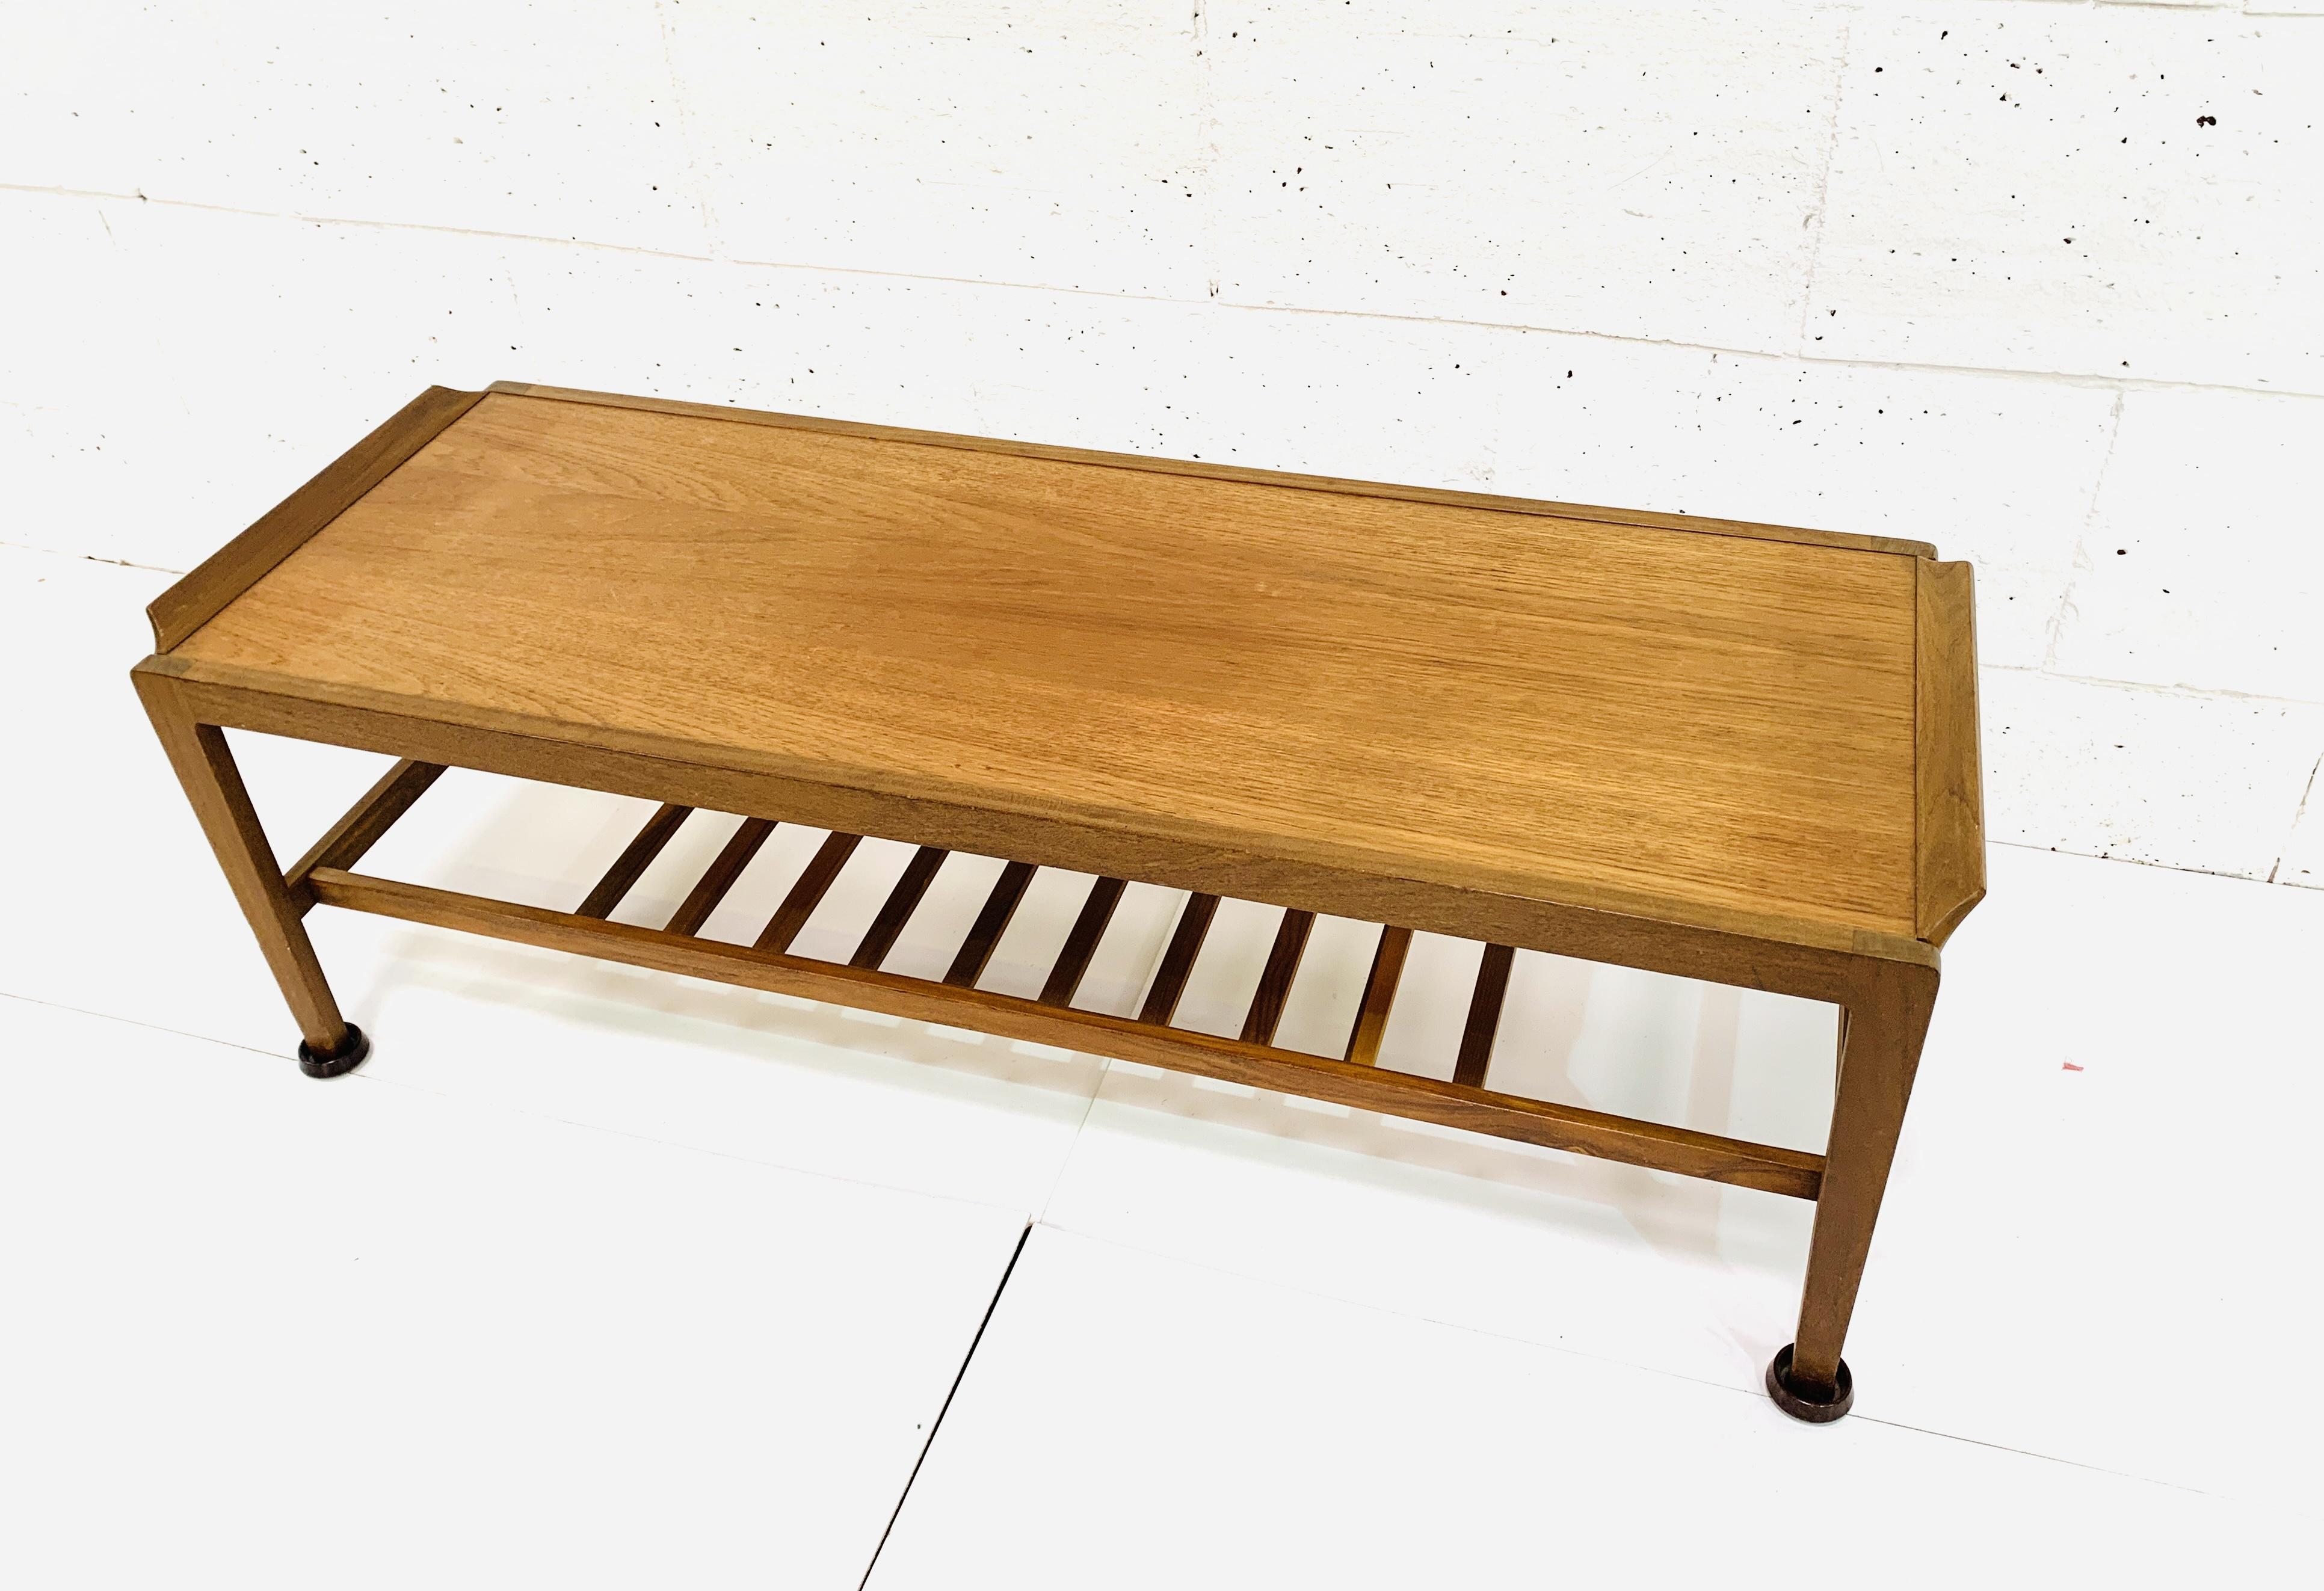 Teak coffee table with newspaper rack under - Image 4 of 4